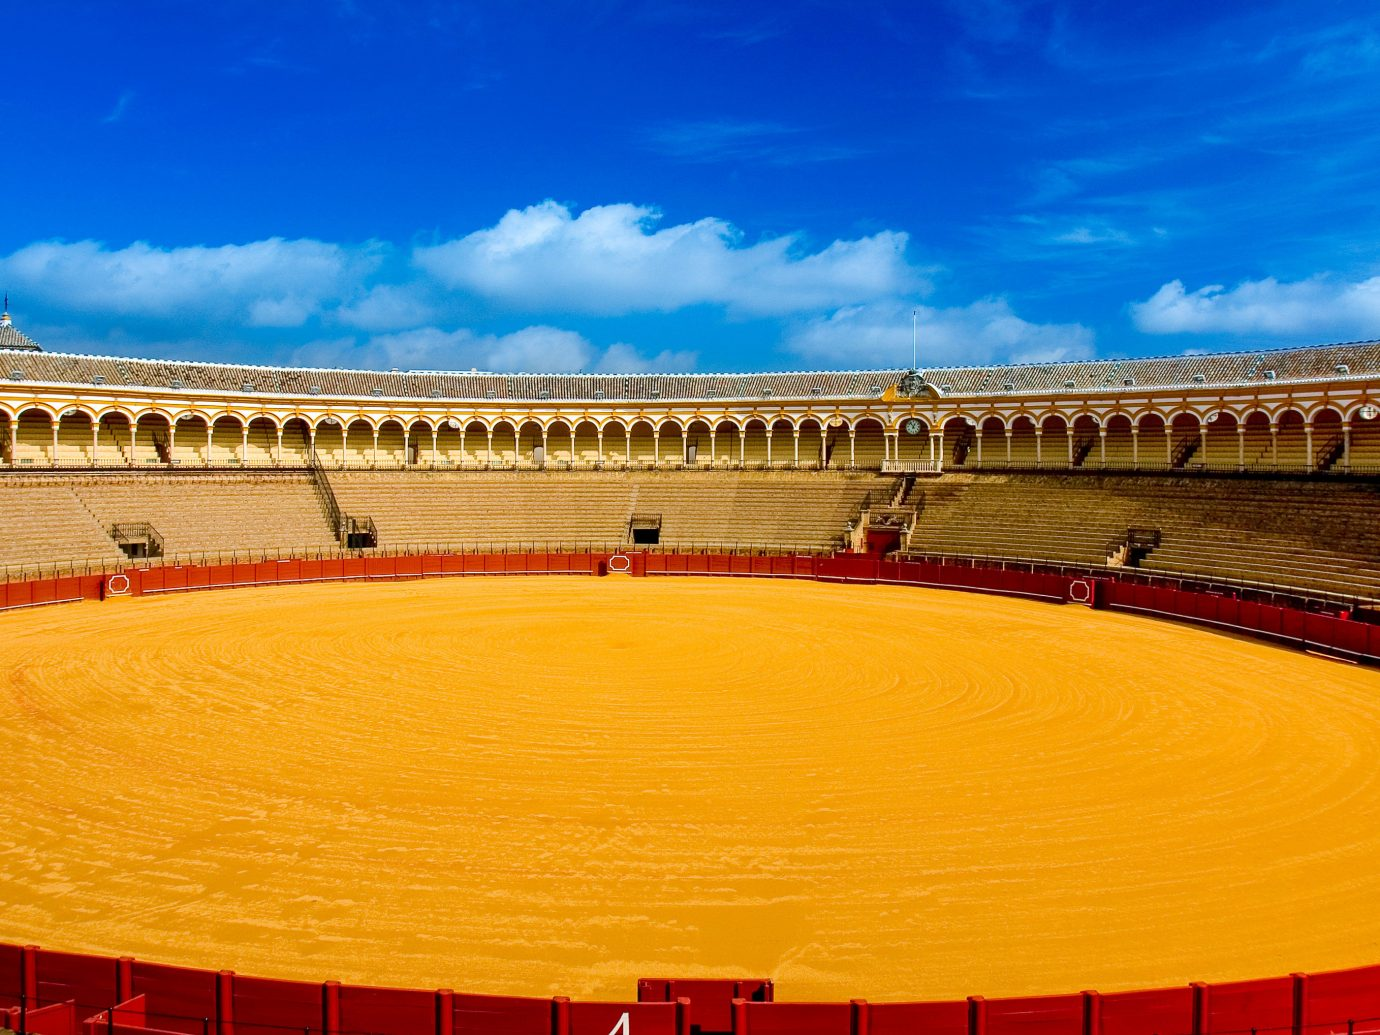 Offbeat sky sport venue stadium amphitheatre landmark building bullring yellow outdoor structure arena landscape